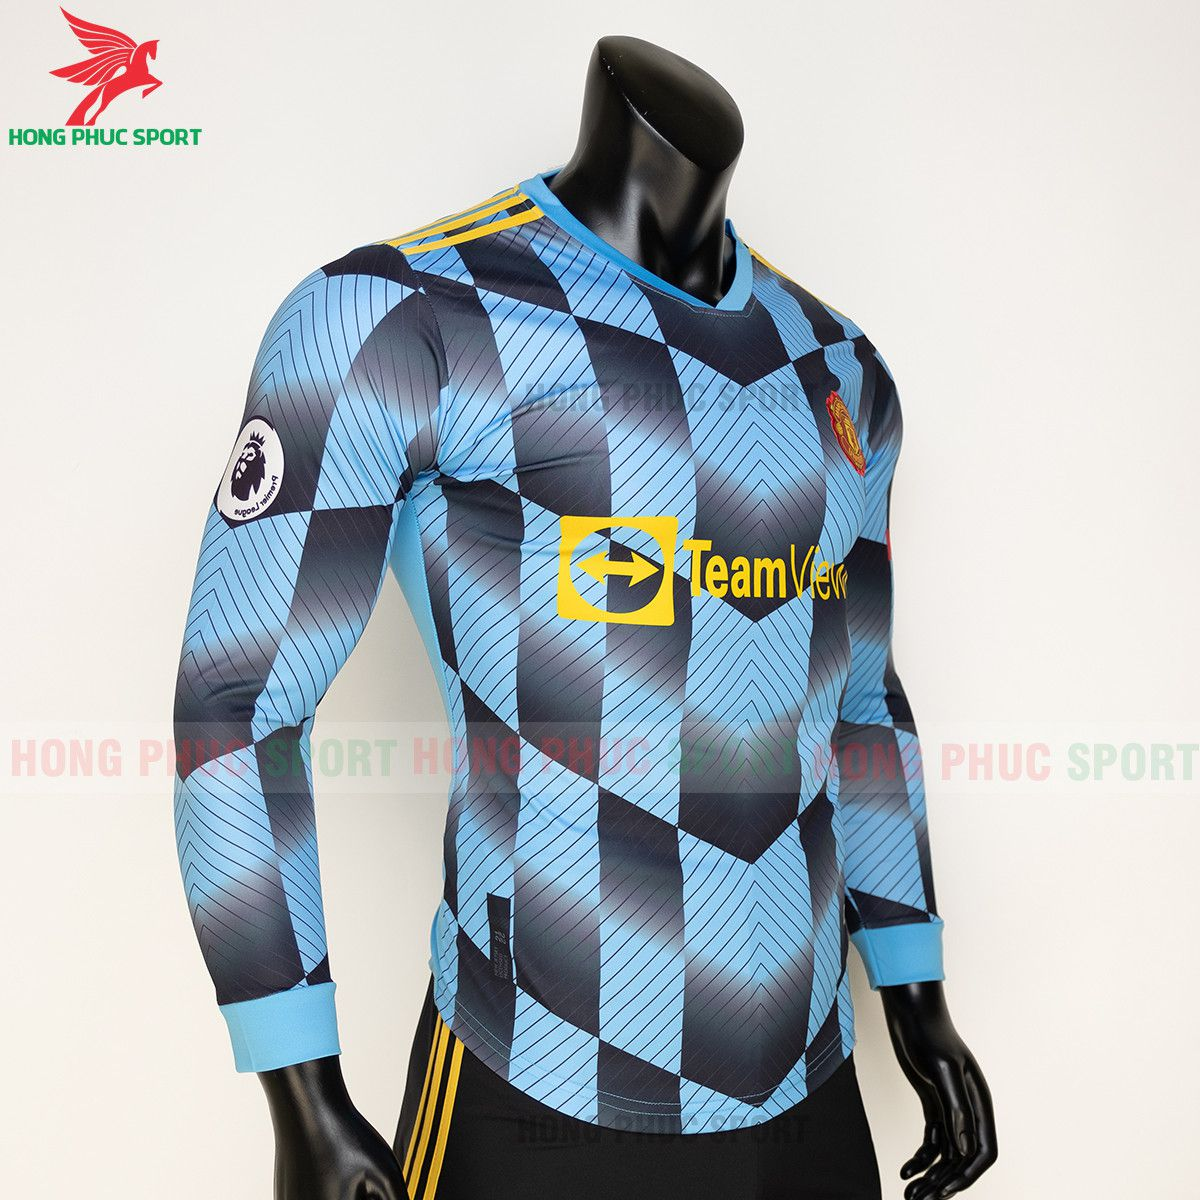 https://cdn.hongphucsport.com/unsafe/s4.shopbay.vn/files/285/ao-bong-da-mu-dai-tay-2021-22-mau-thu-3-thun-lanh-5-615d4f8e263ba.jpg